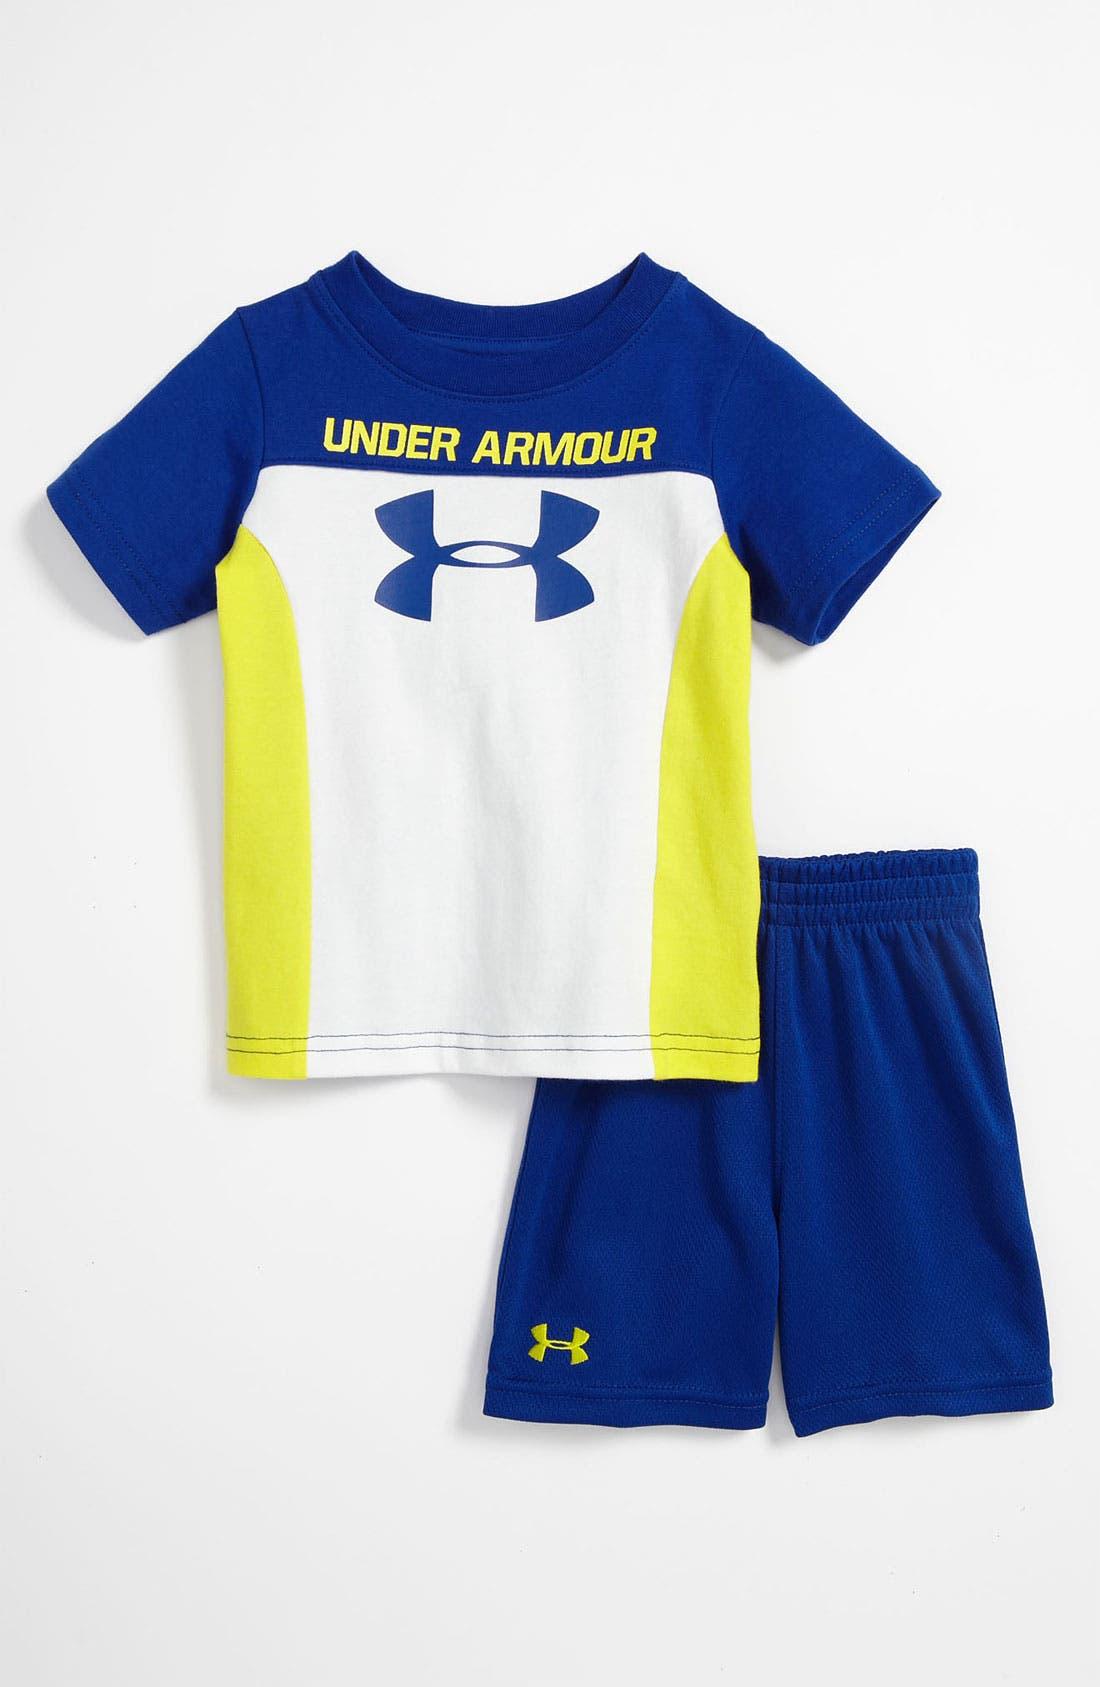 Main Image - Under Armour 'Mixed Media' T-Shirt & Shorts (Infant)